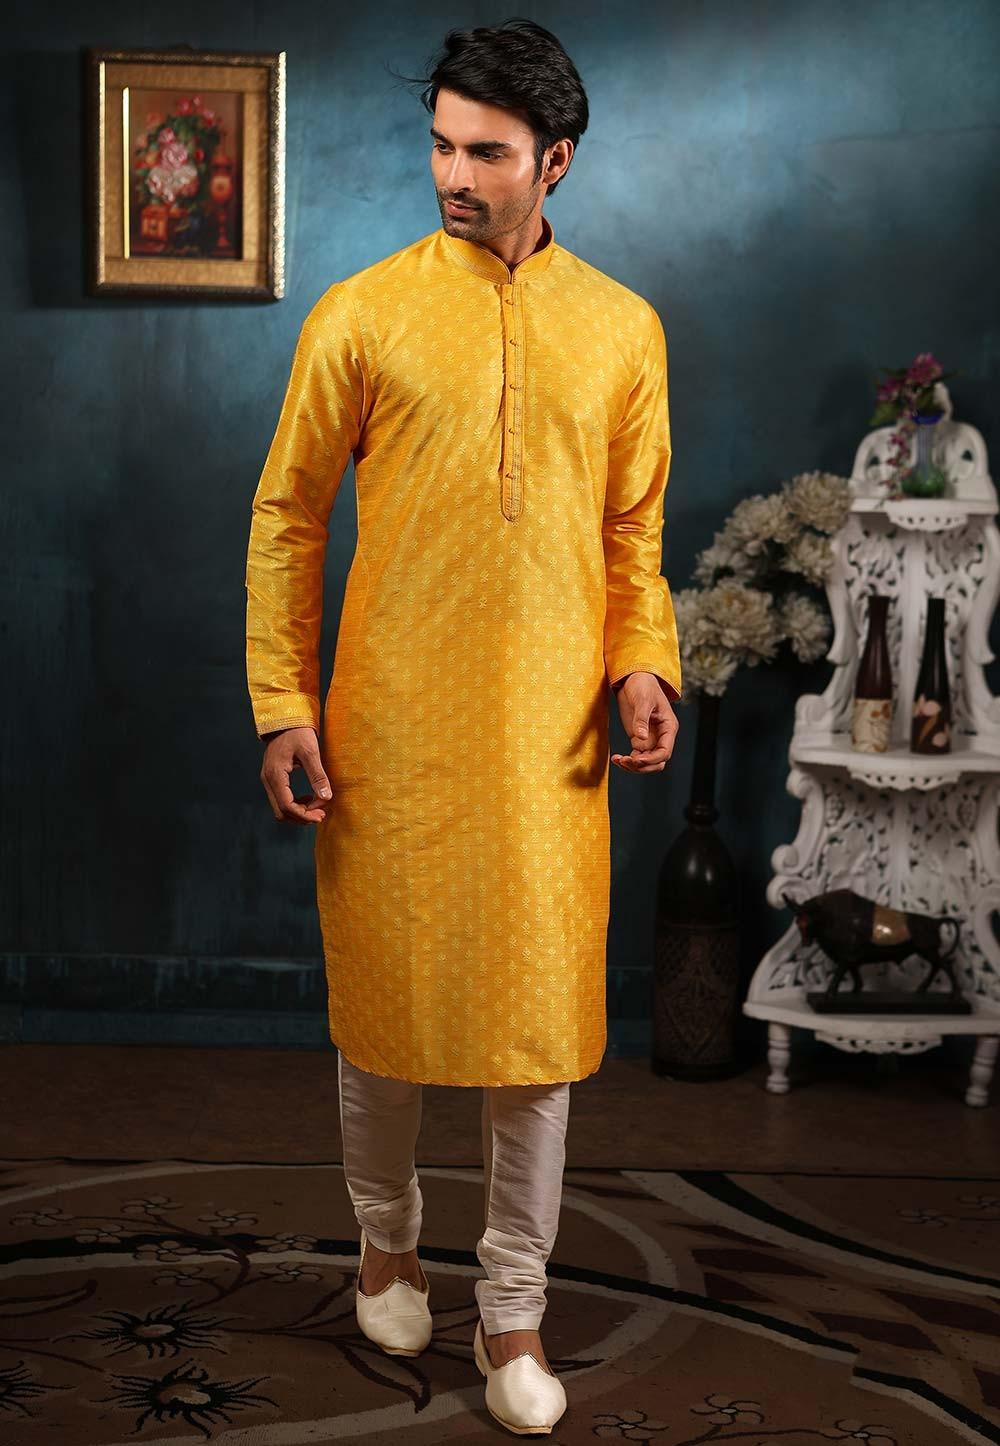 Yellow Colour Indian Wedding Kurta Pajama.